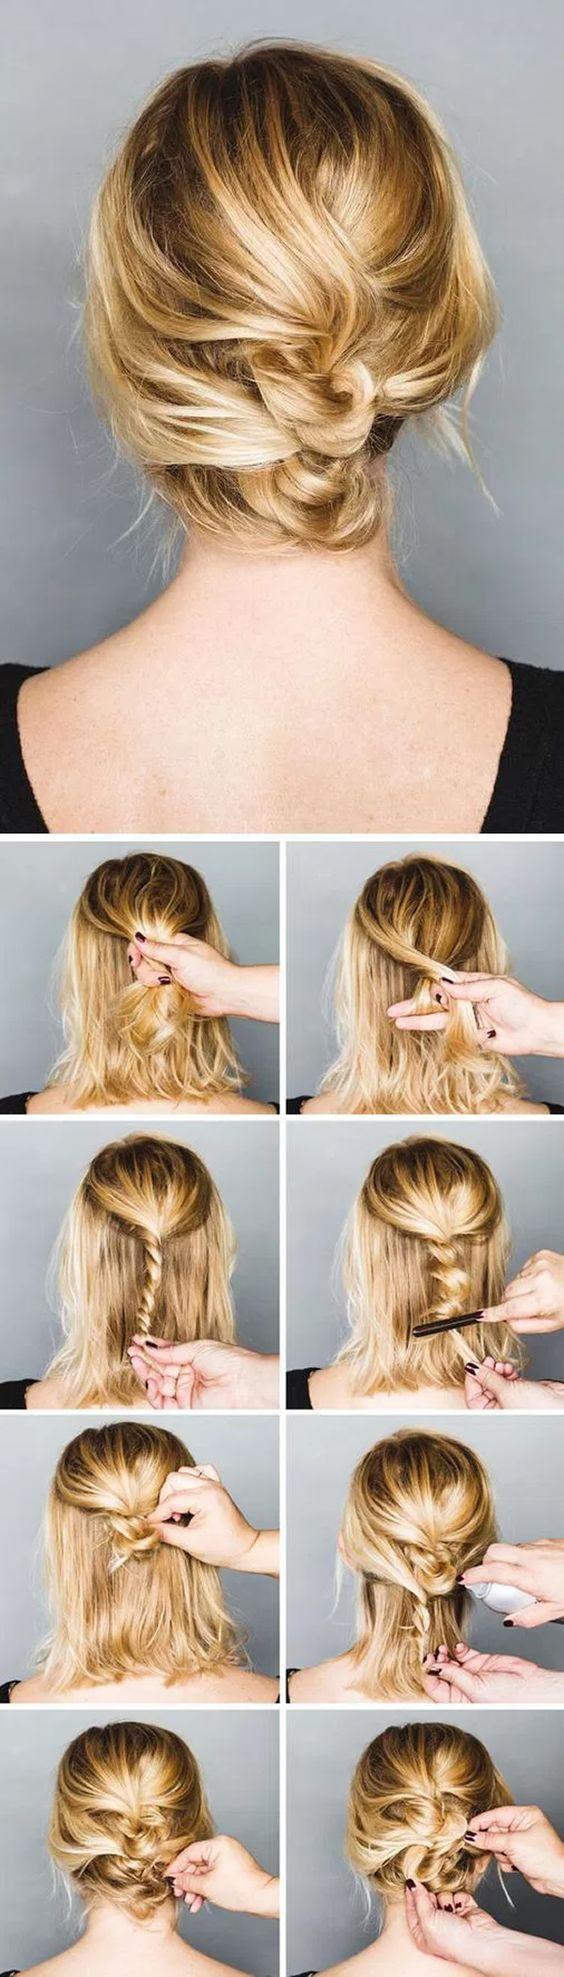 6 excelentes peinados recogidos para diferentes momentos del día